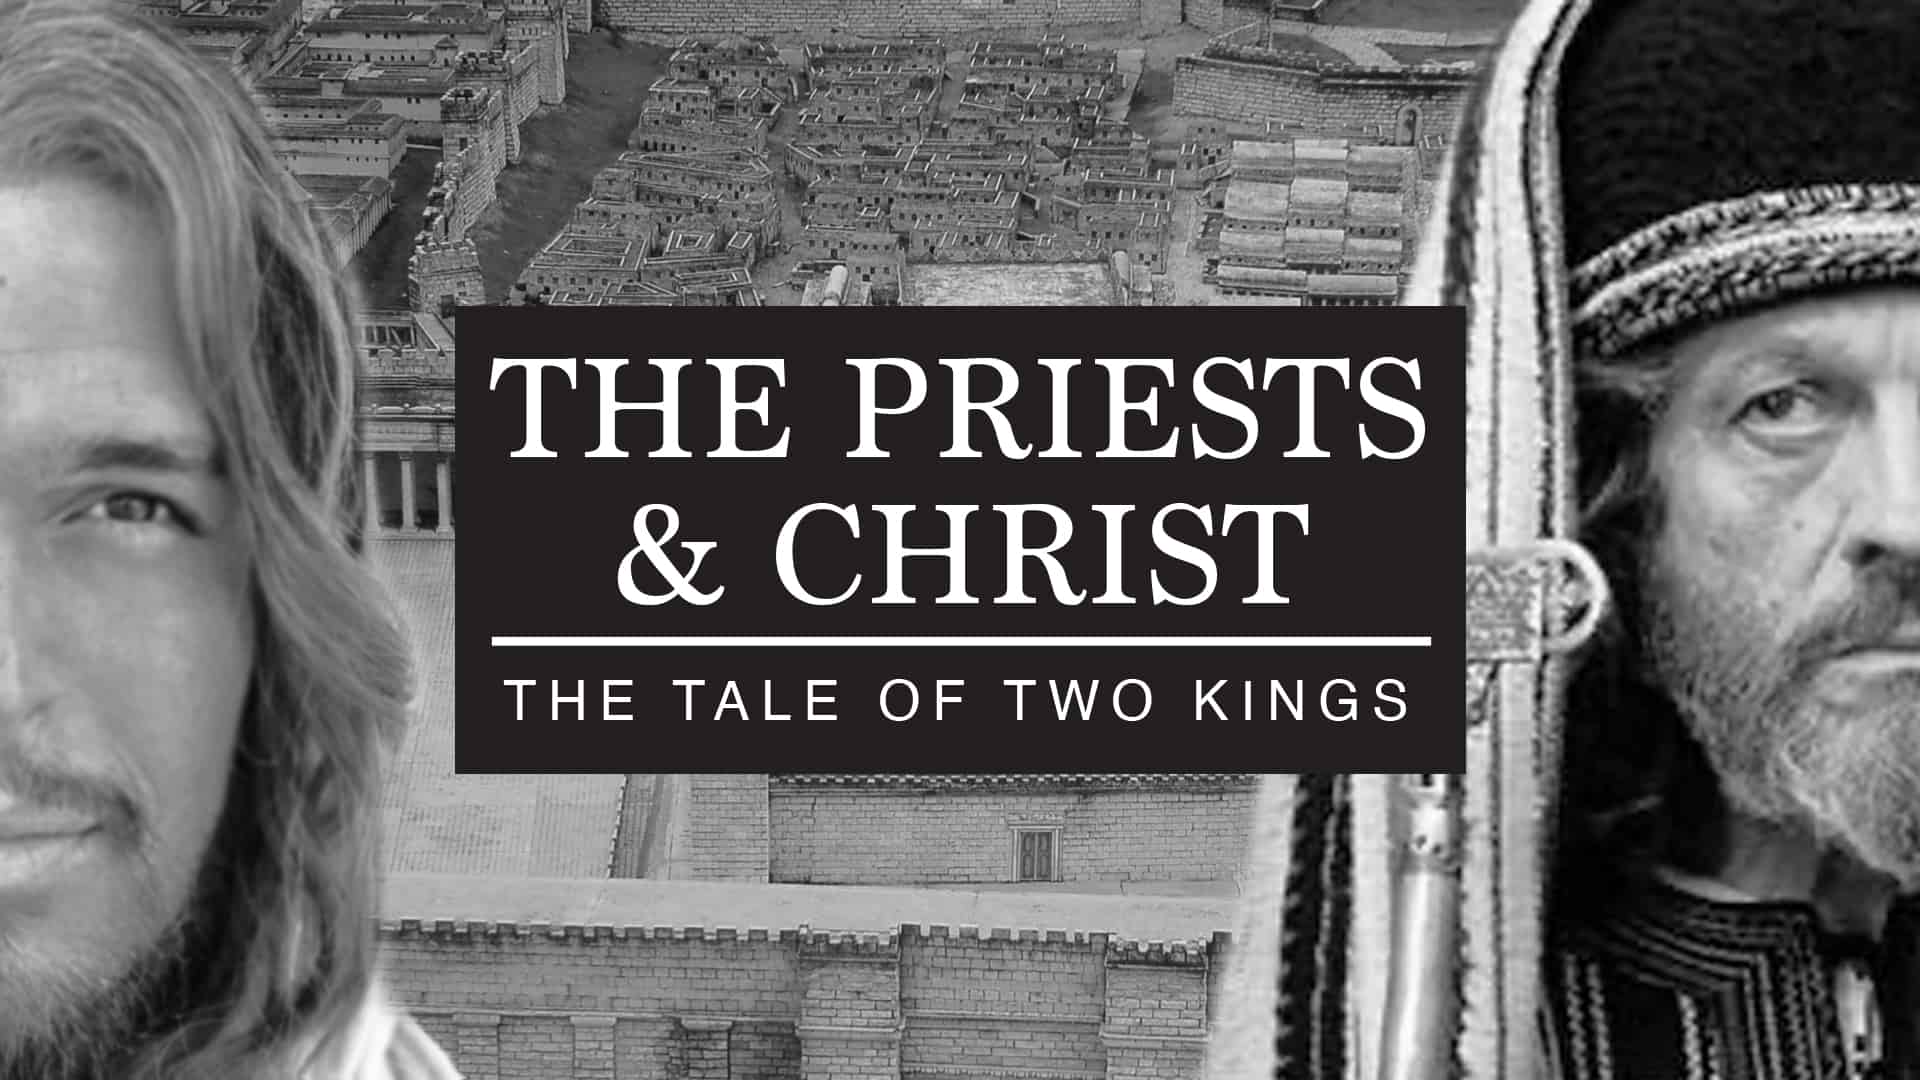 The Priests & Christ